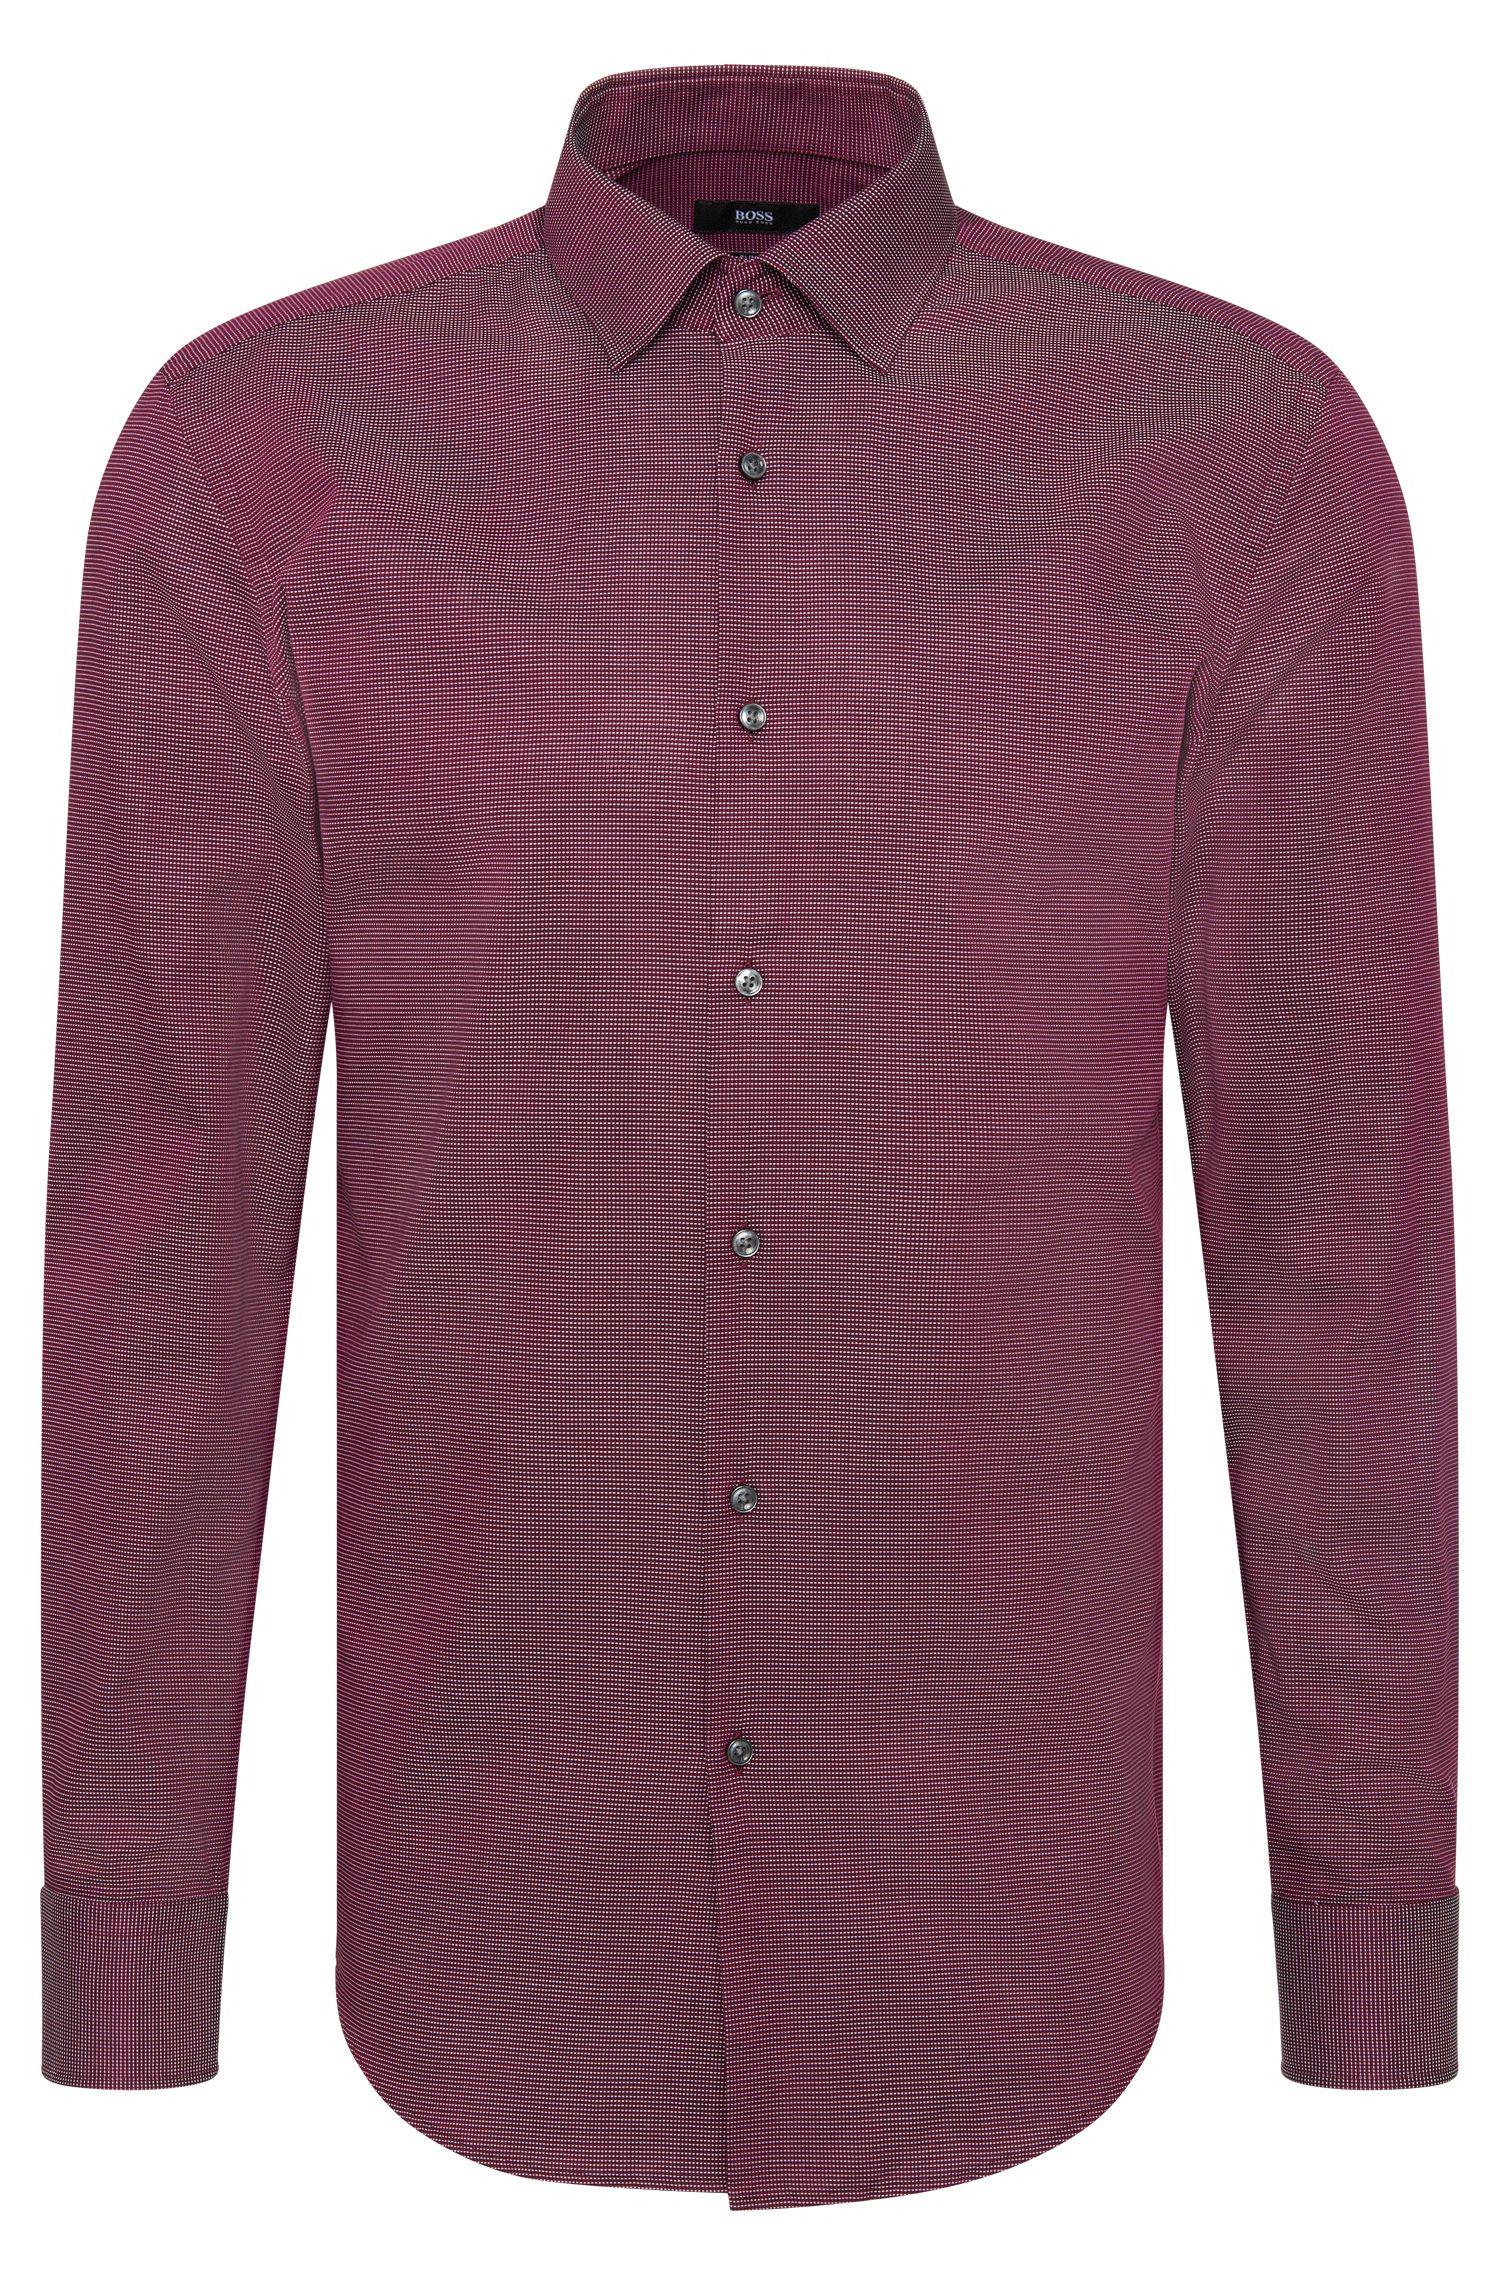 'Jenno'   Slim Fit, Cotton Contrast Textured Dress Shirt